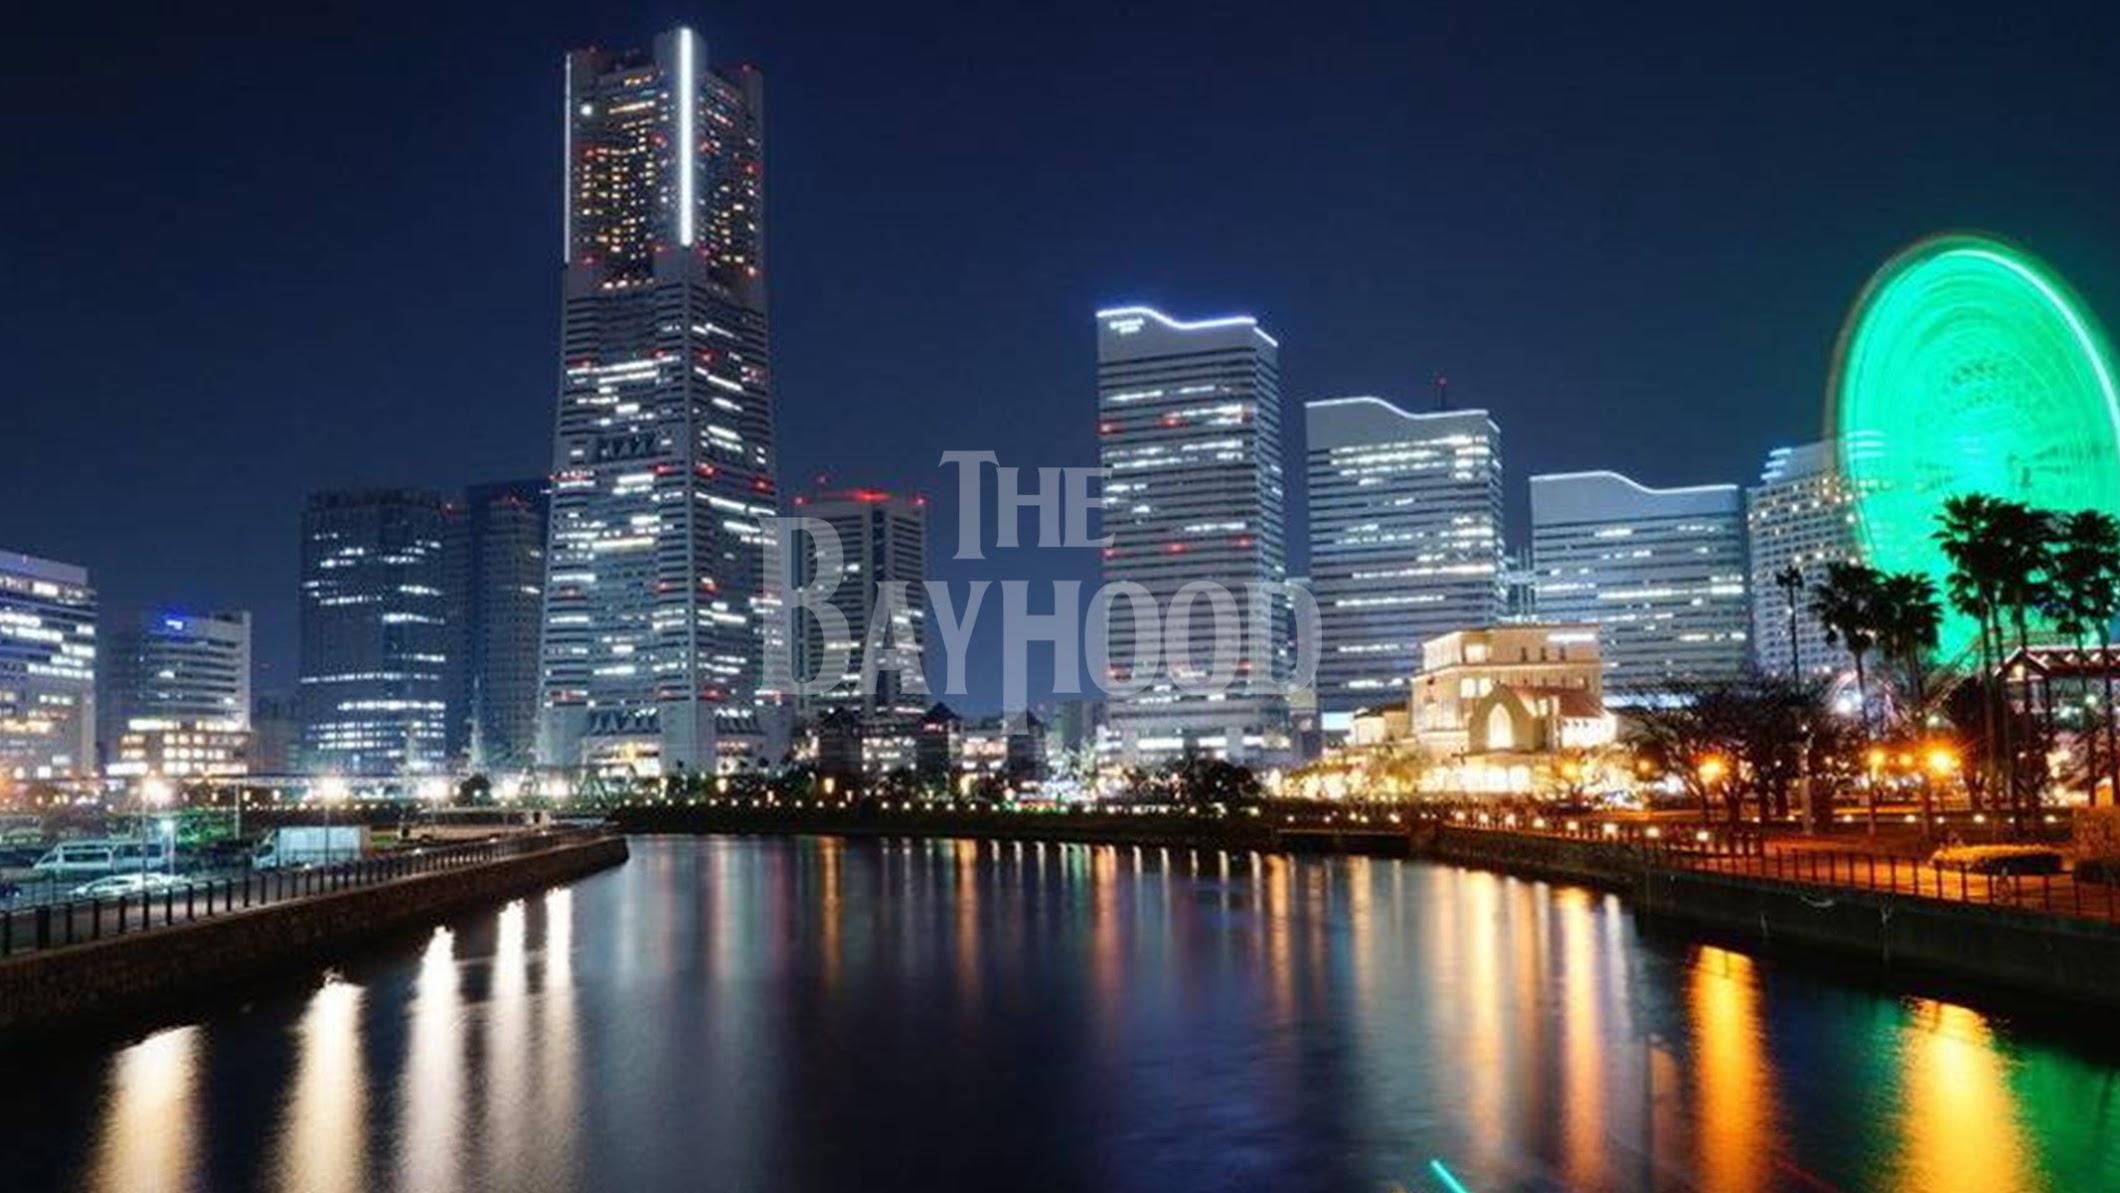 BAYHOOD official